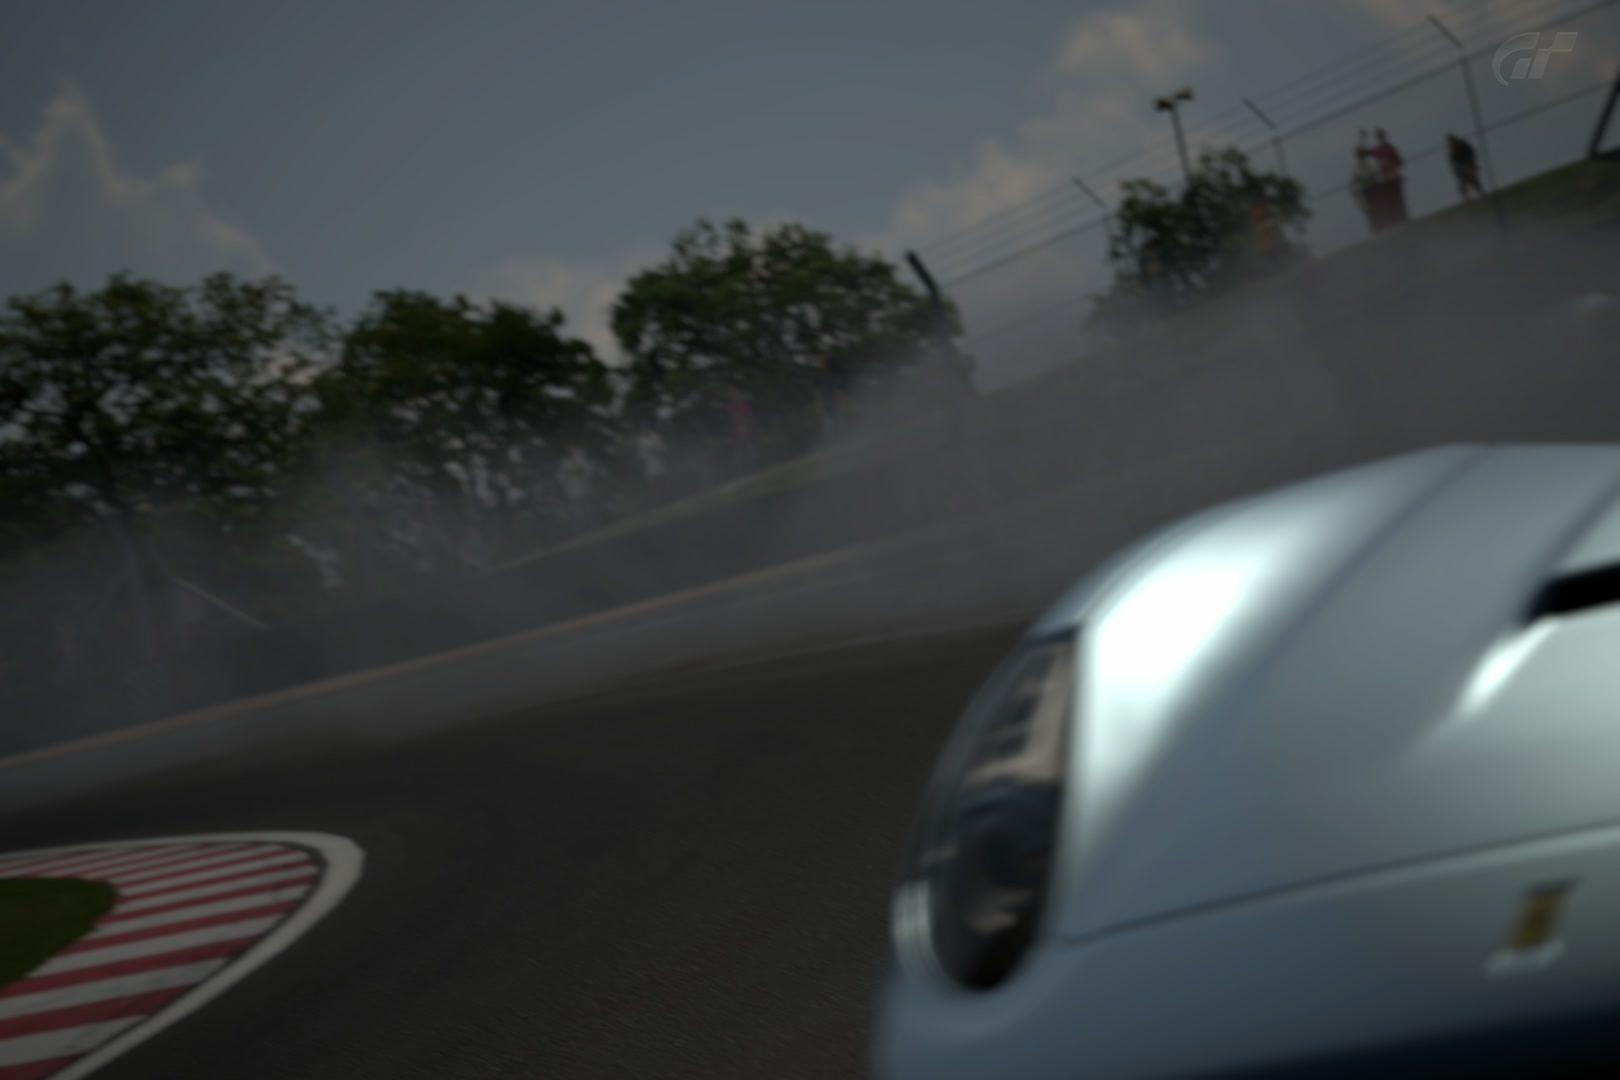 Brands Hatch Grand Prix Circuit_6.jpg